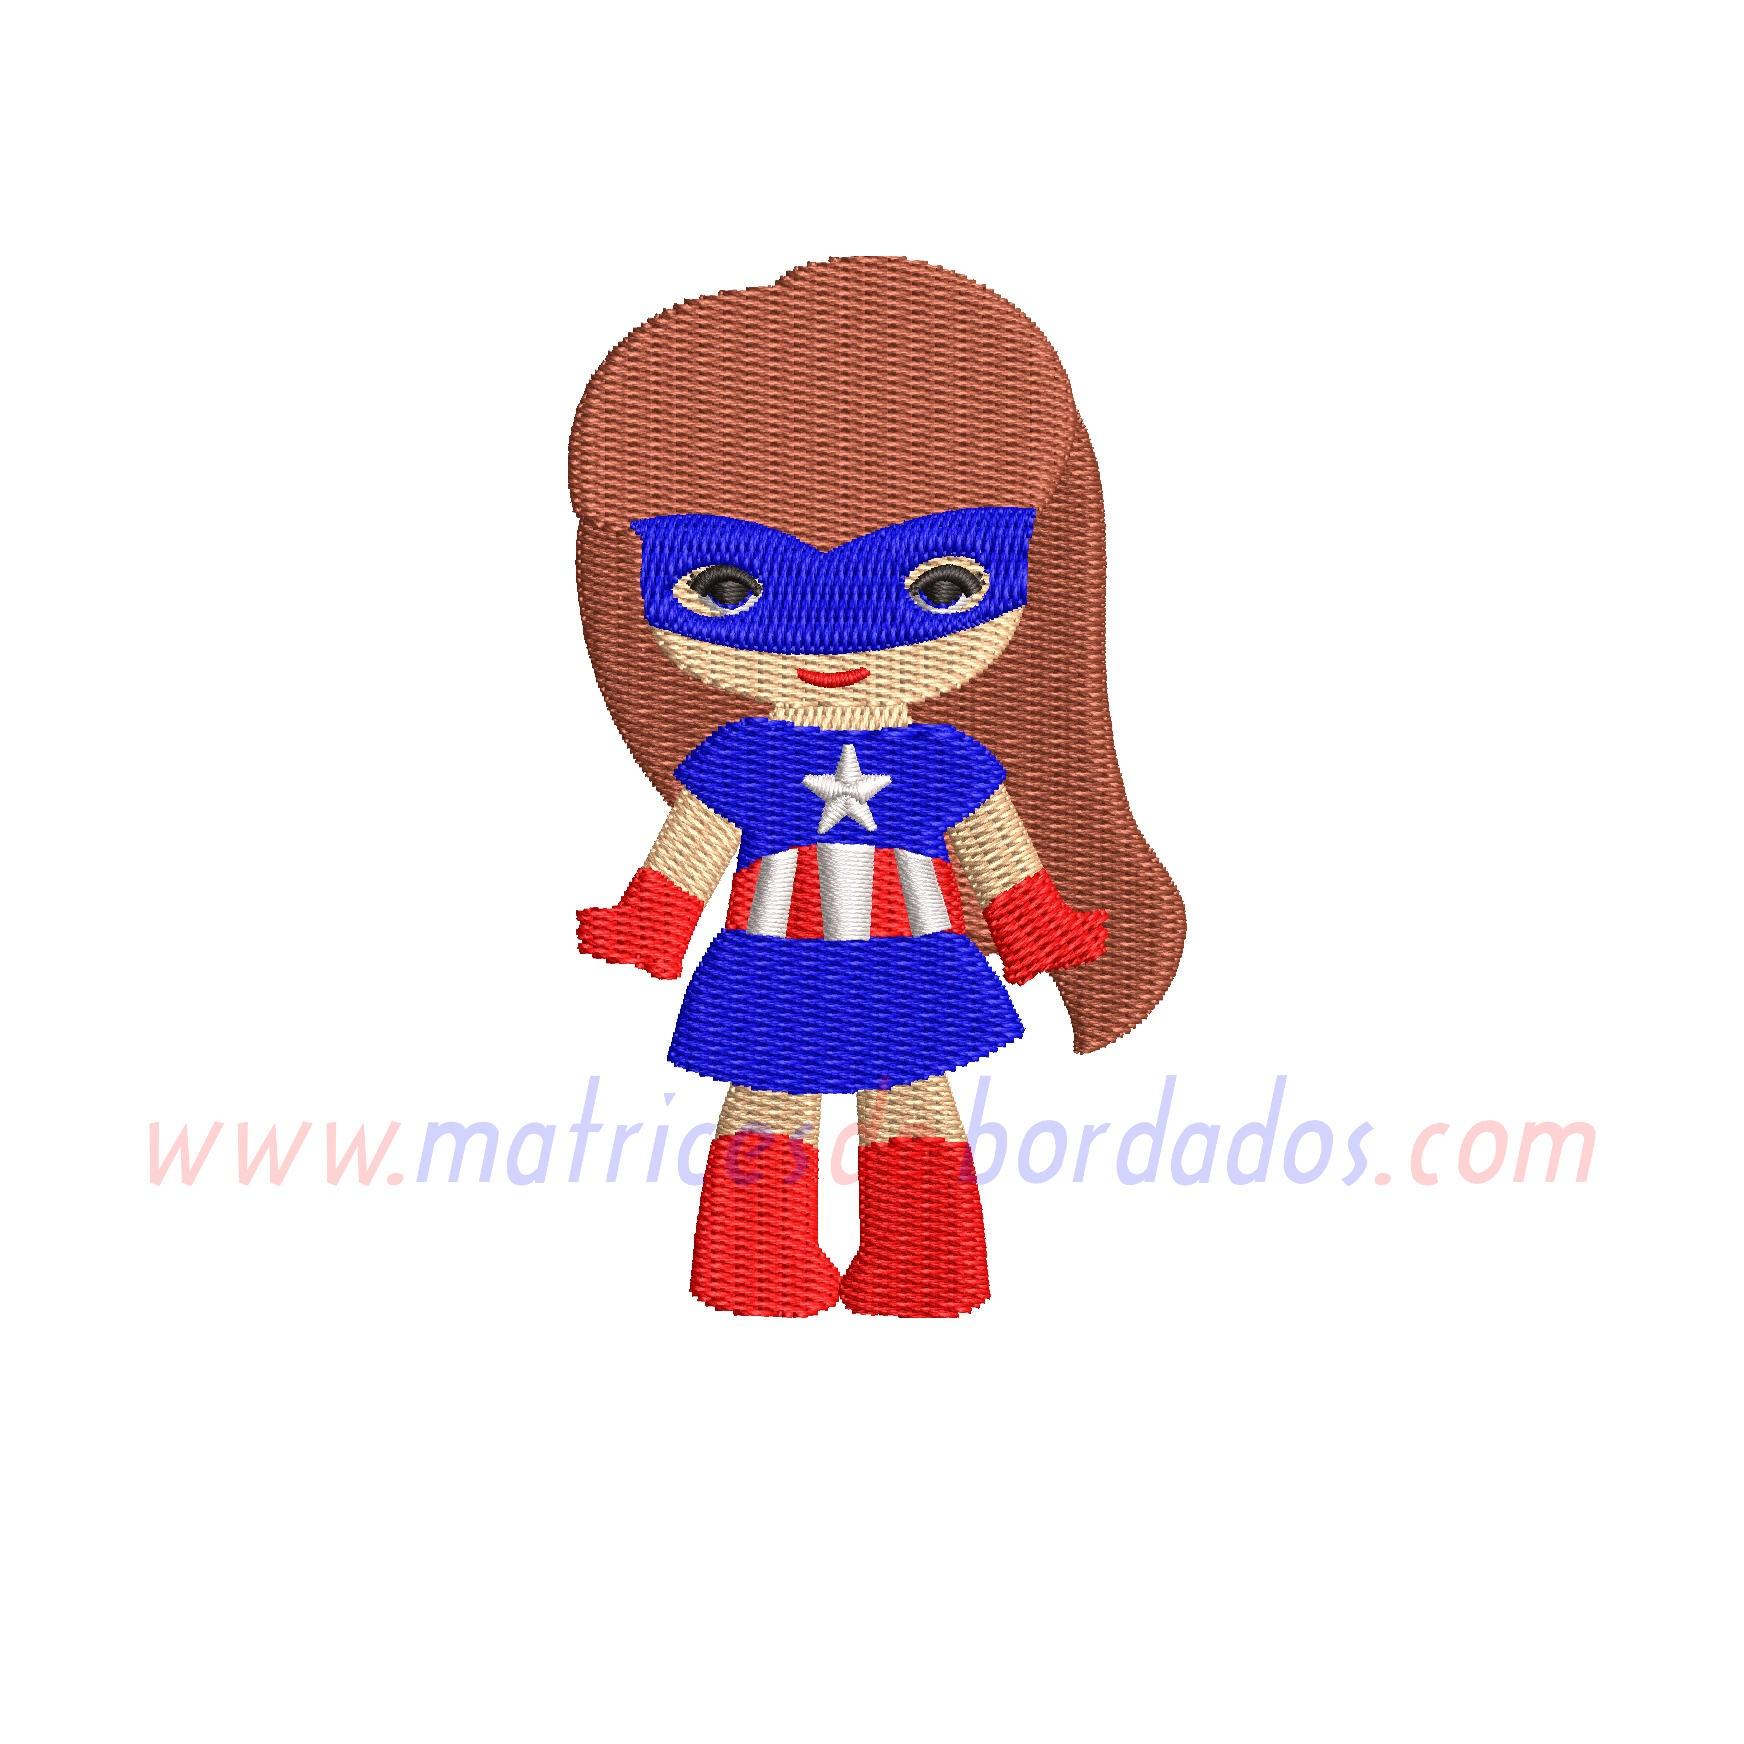 NB64CP - Supergirl